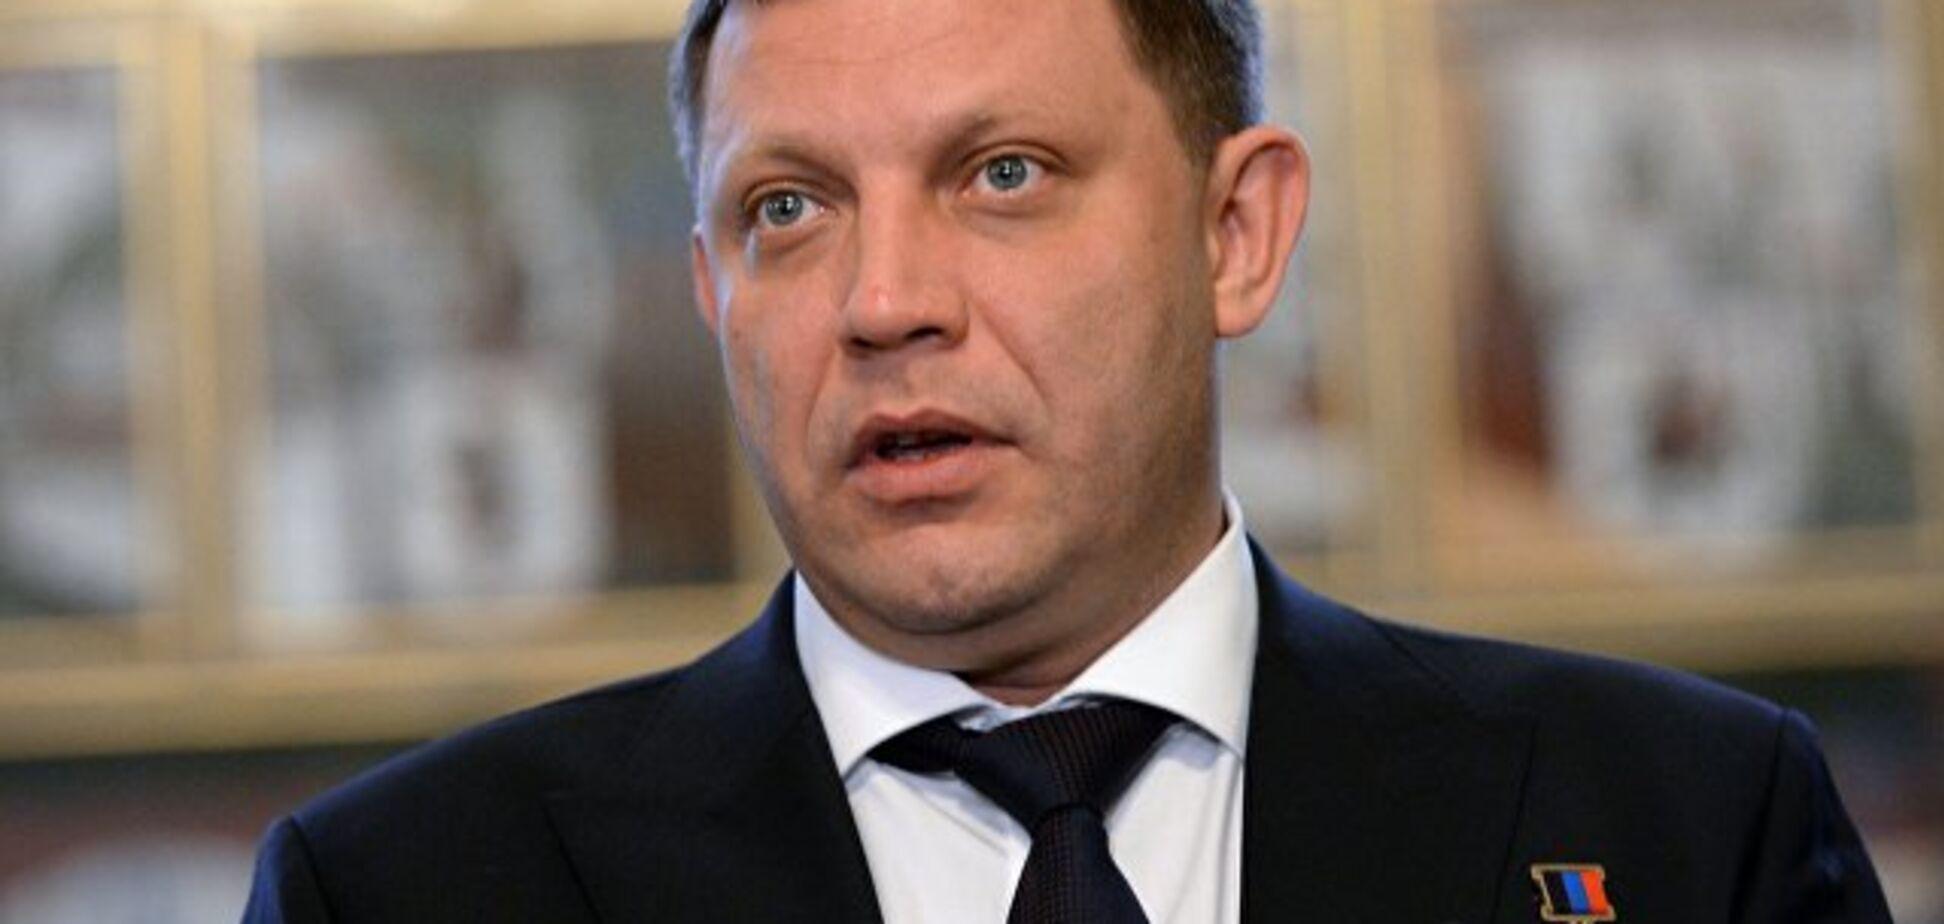 'Ранение' Захарченко: журналист анонсировал 'отставку' главаря 'ДНР'